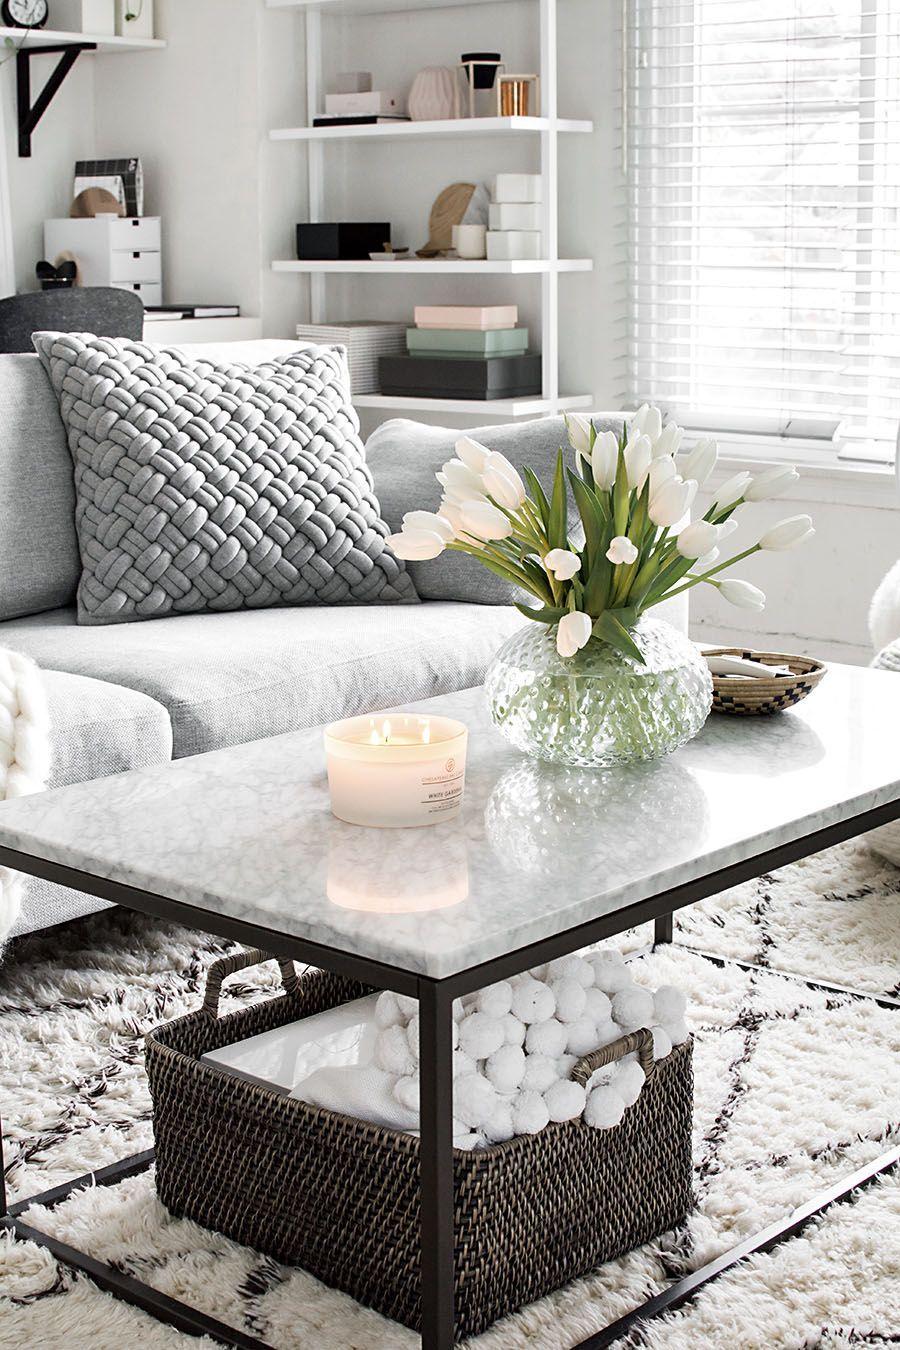 11 Free Modern Coffee Table Ideas You Can Diy Today Moderncoffeetable Coffeetableideas Coffeetable Coffe Coffee Table Modern Coffee Tables Modern Table [ 1350 x 900 Pixel ]